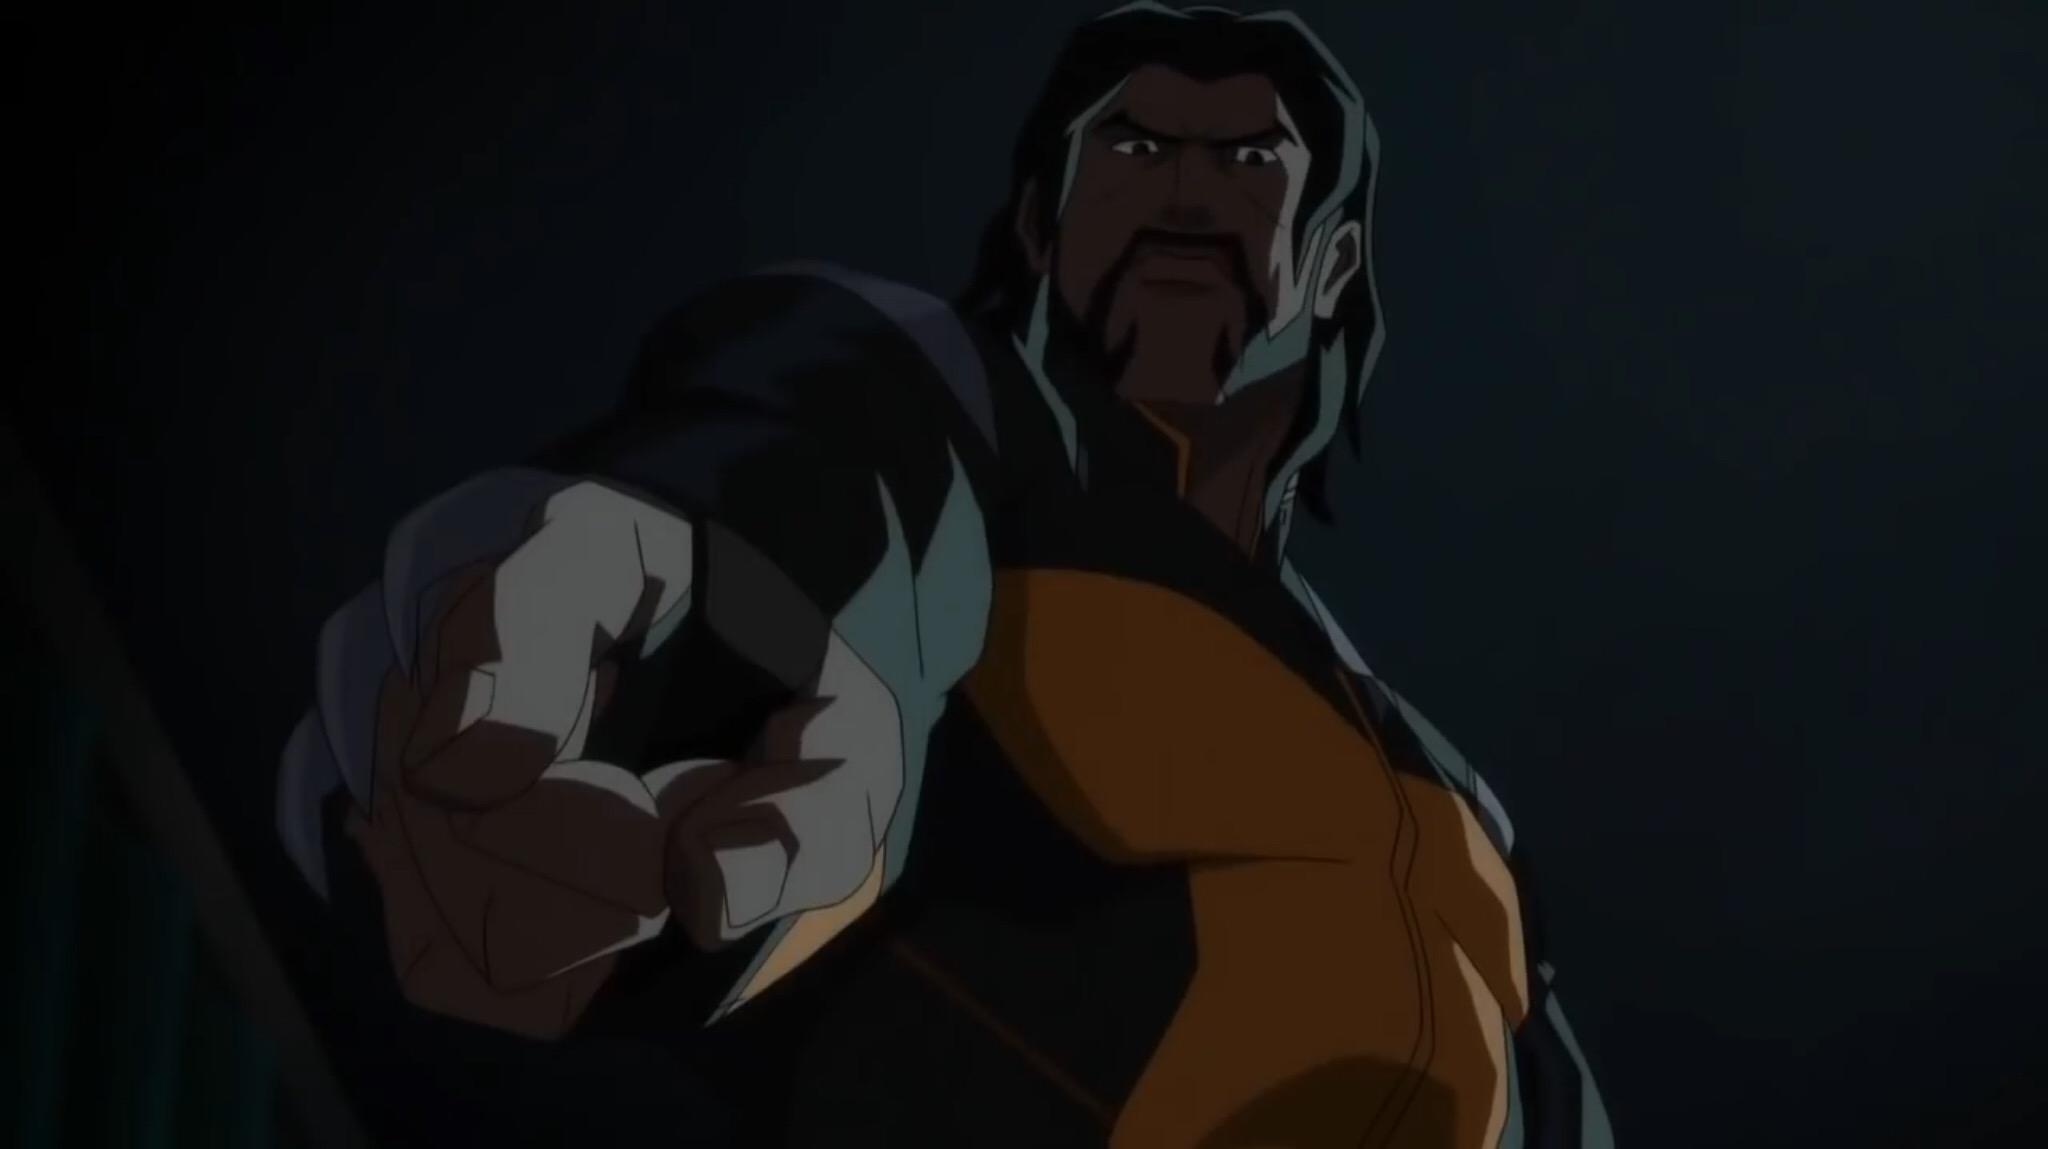 Benjamin Turner (DC Animated Movie Universe)